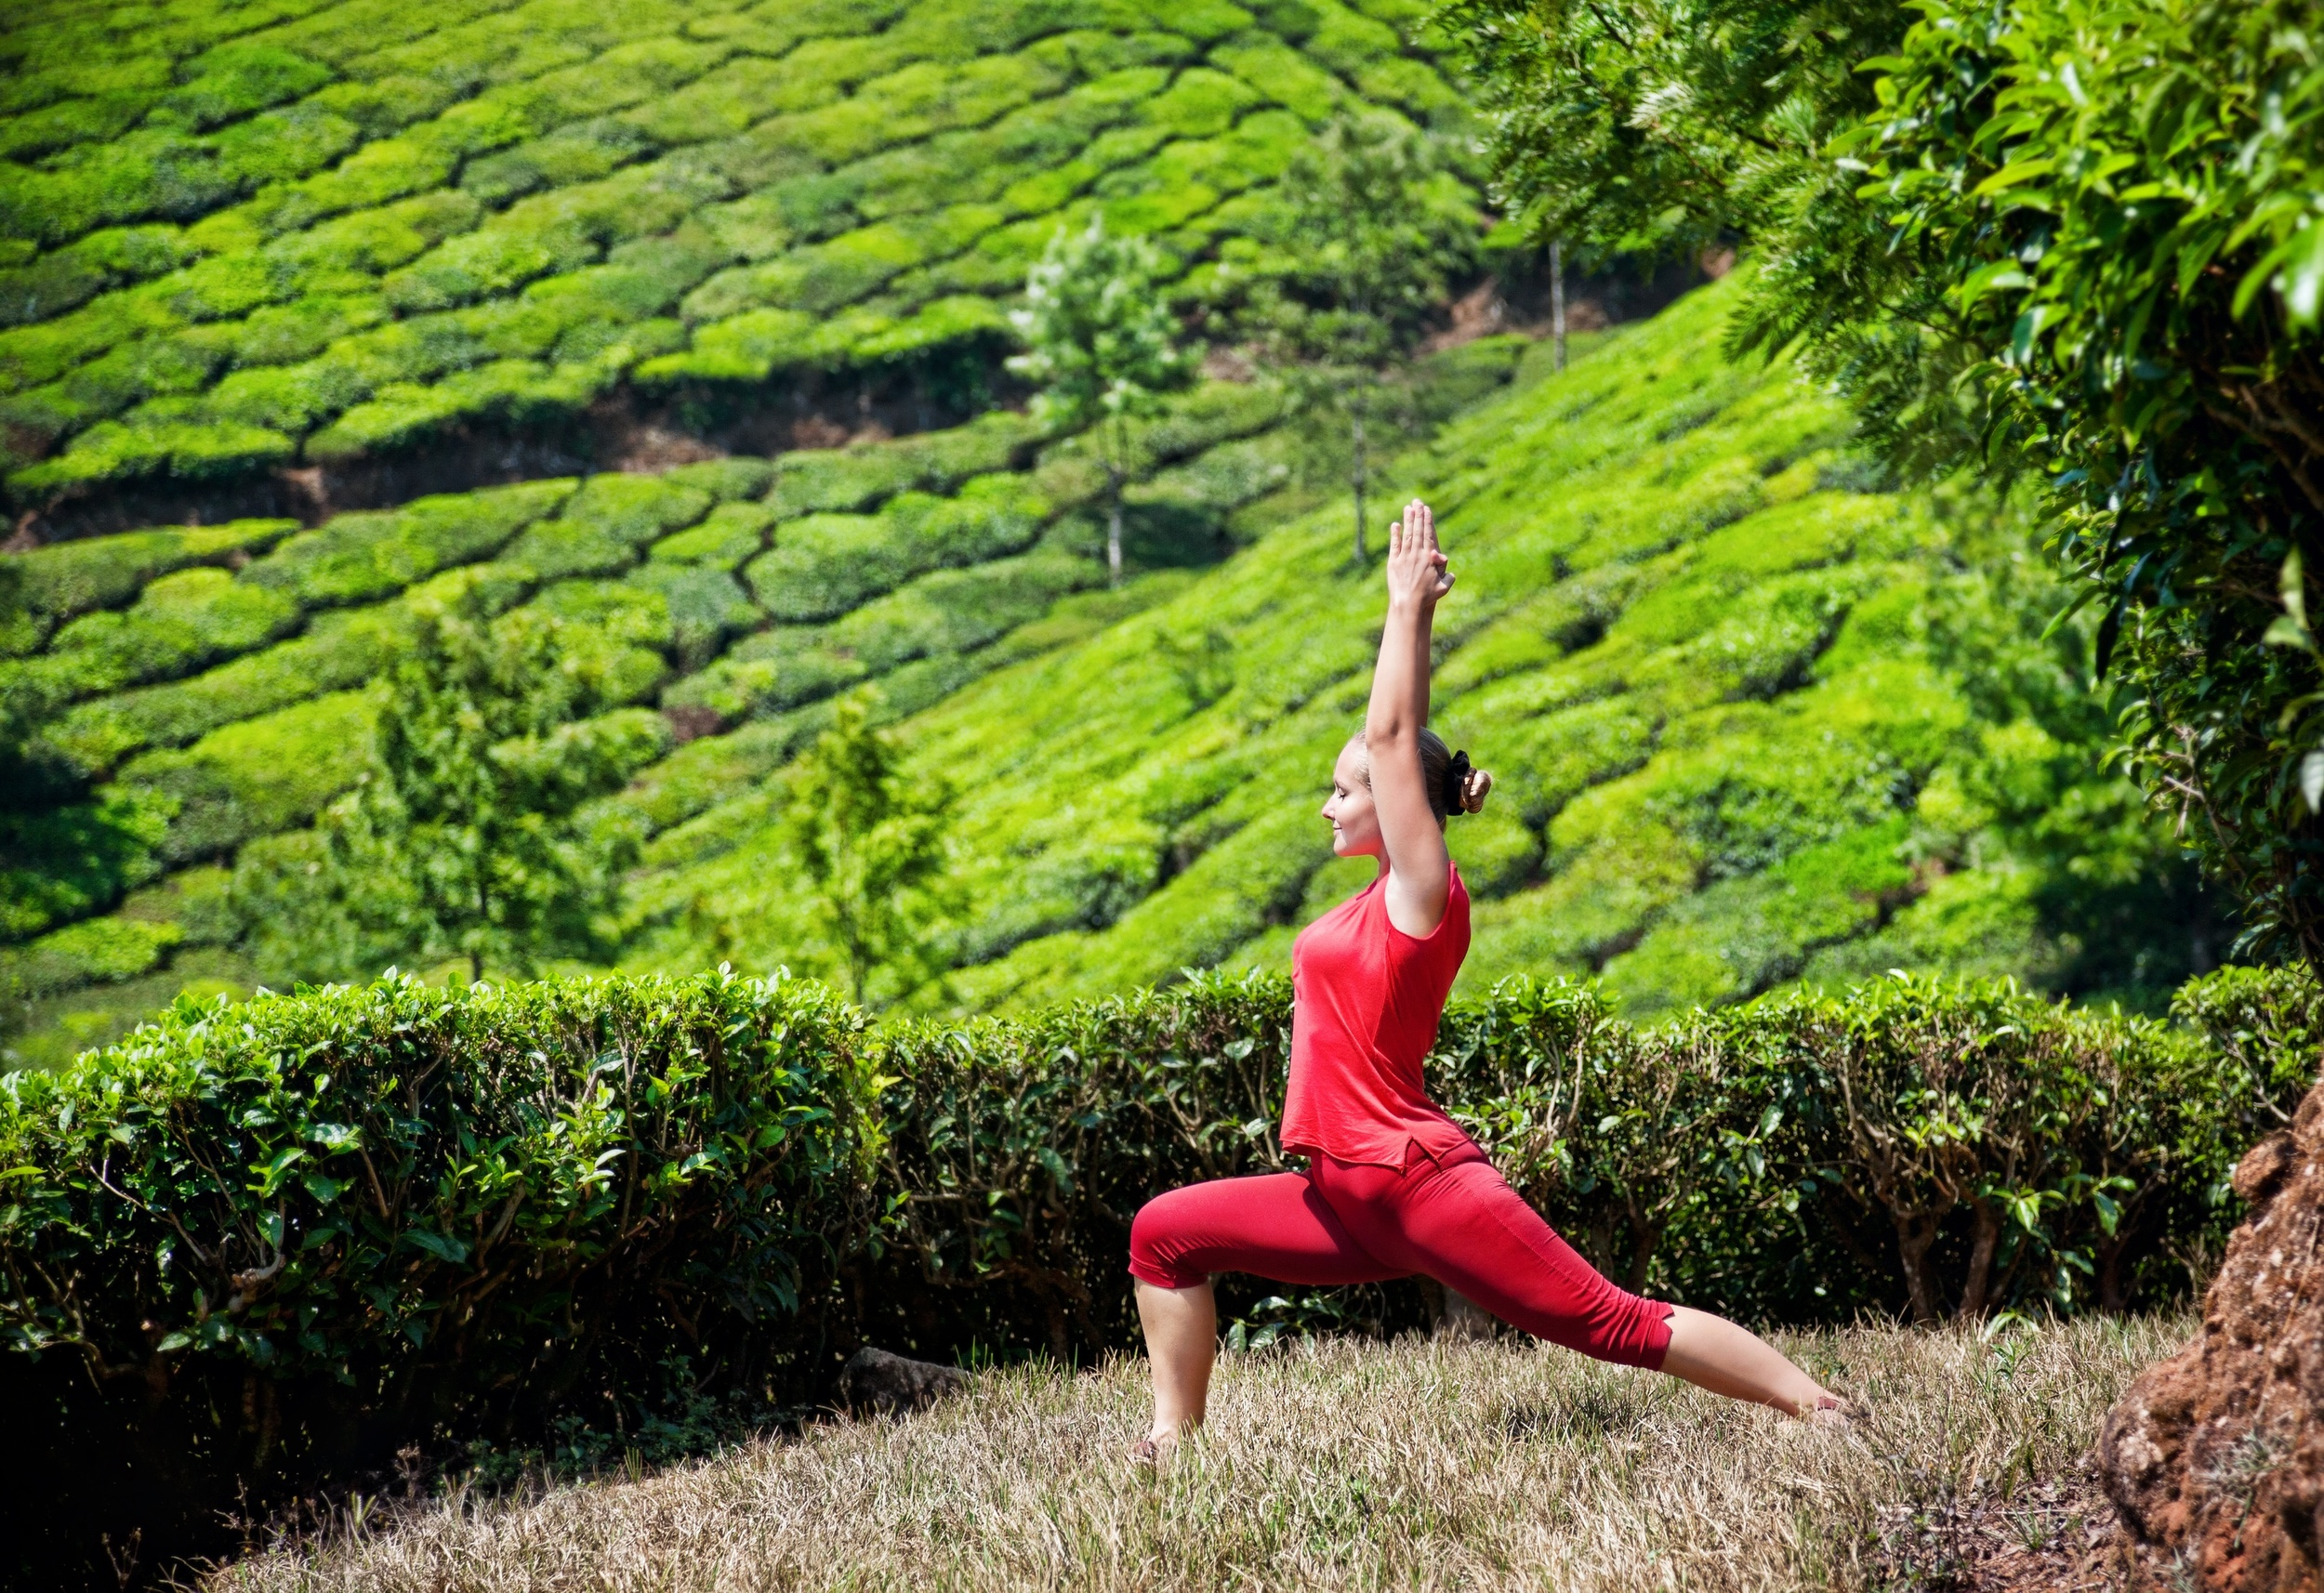 Virtual Yoga - Find Yoga Retreat place